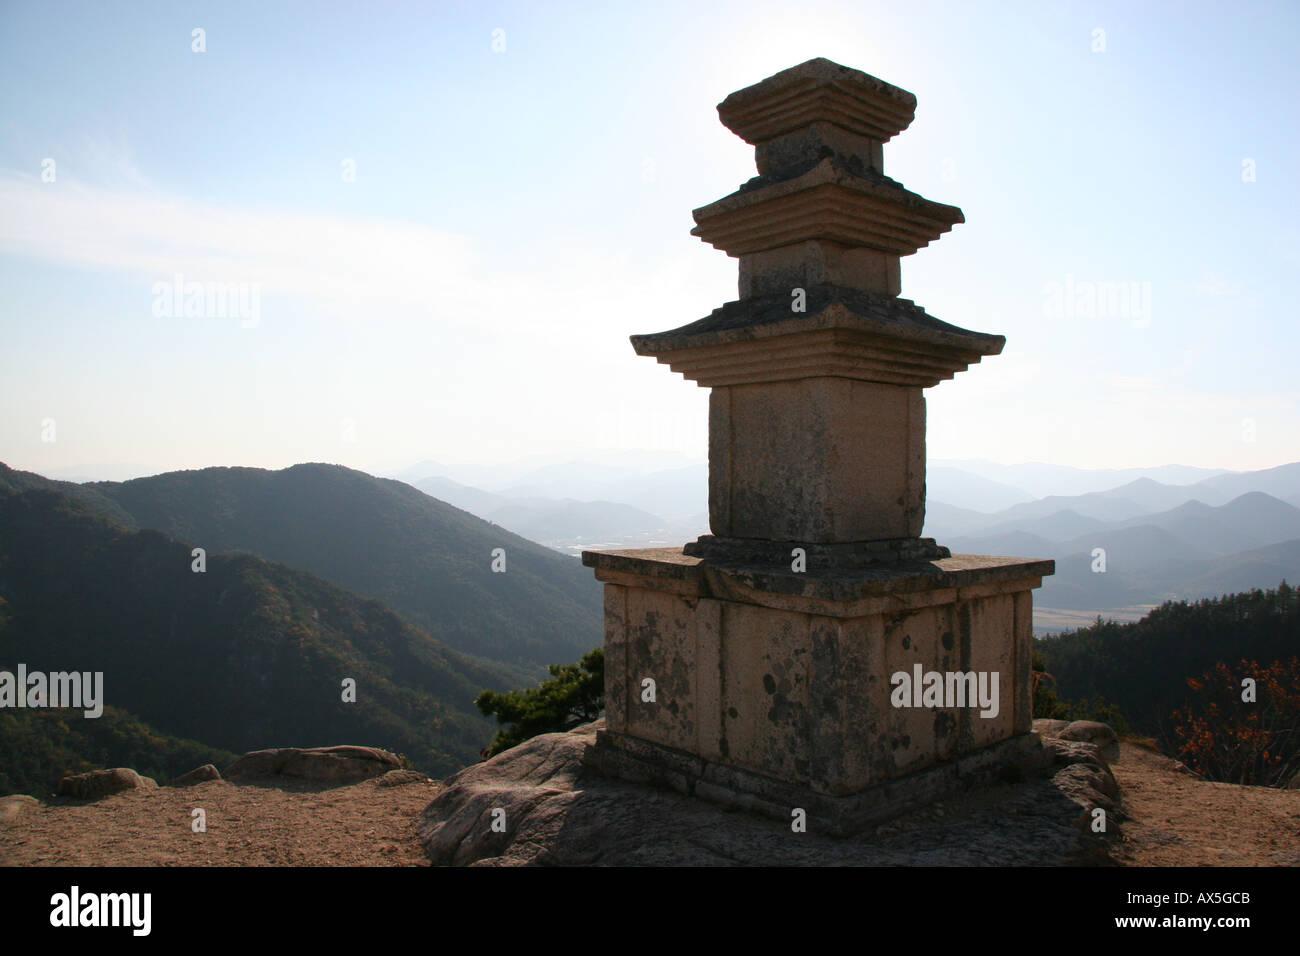 Three-story pagoda in the mountain area of Namsan near Kyeongju in south east Korea Stock Photo